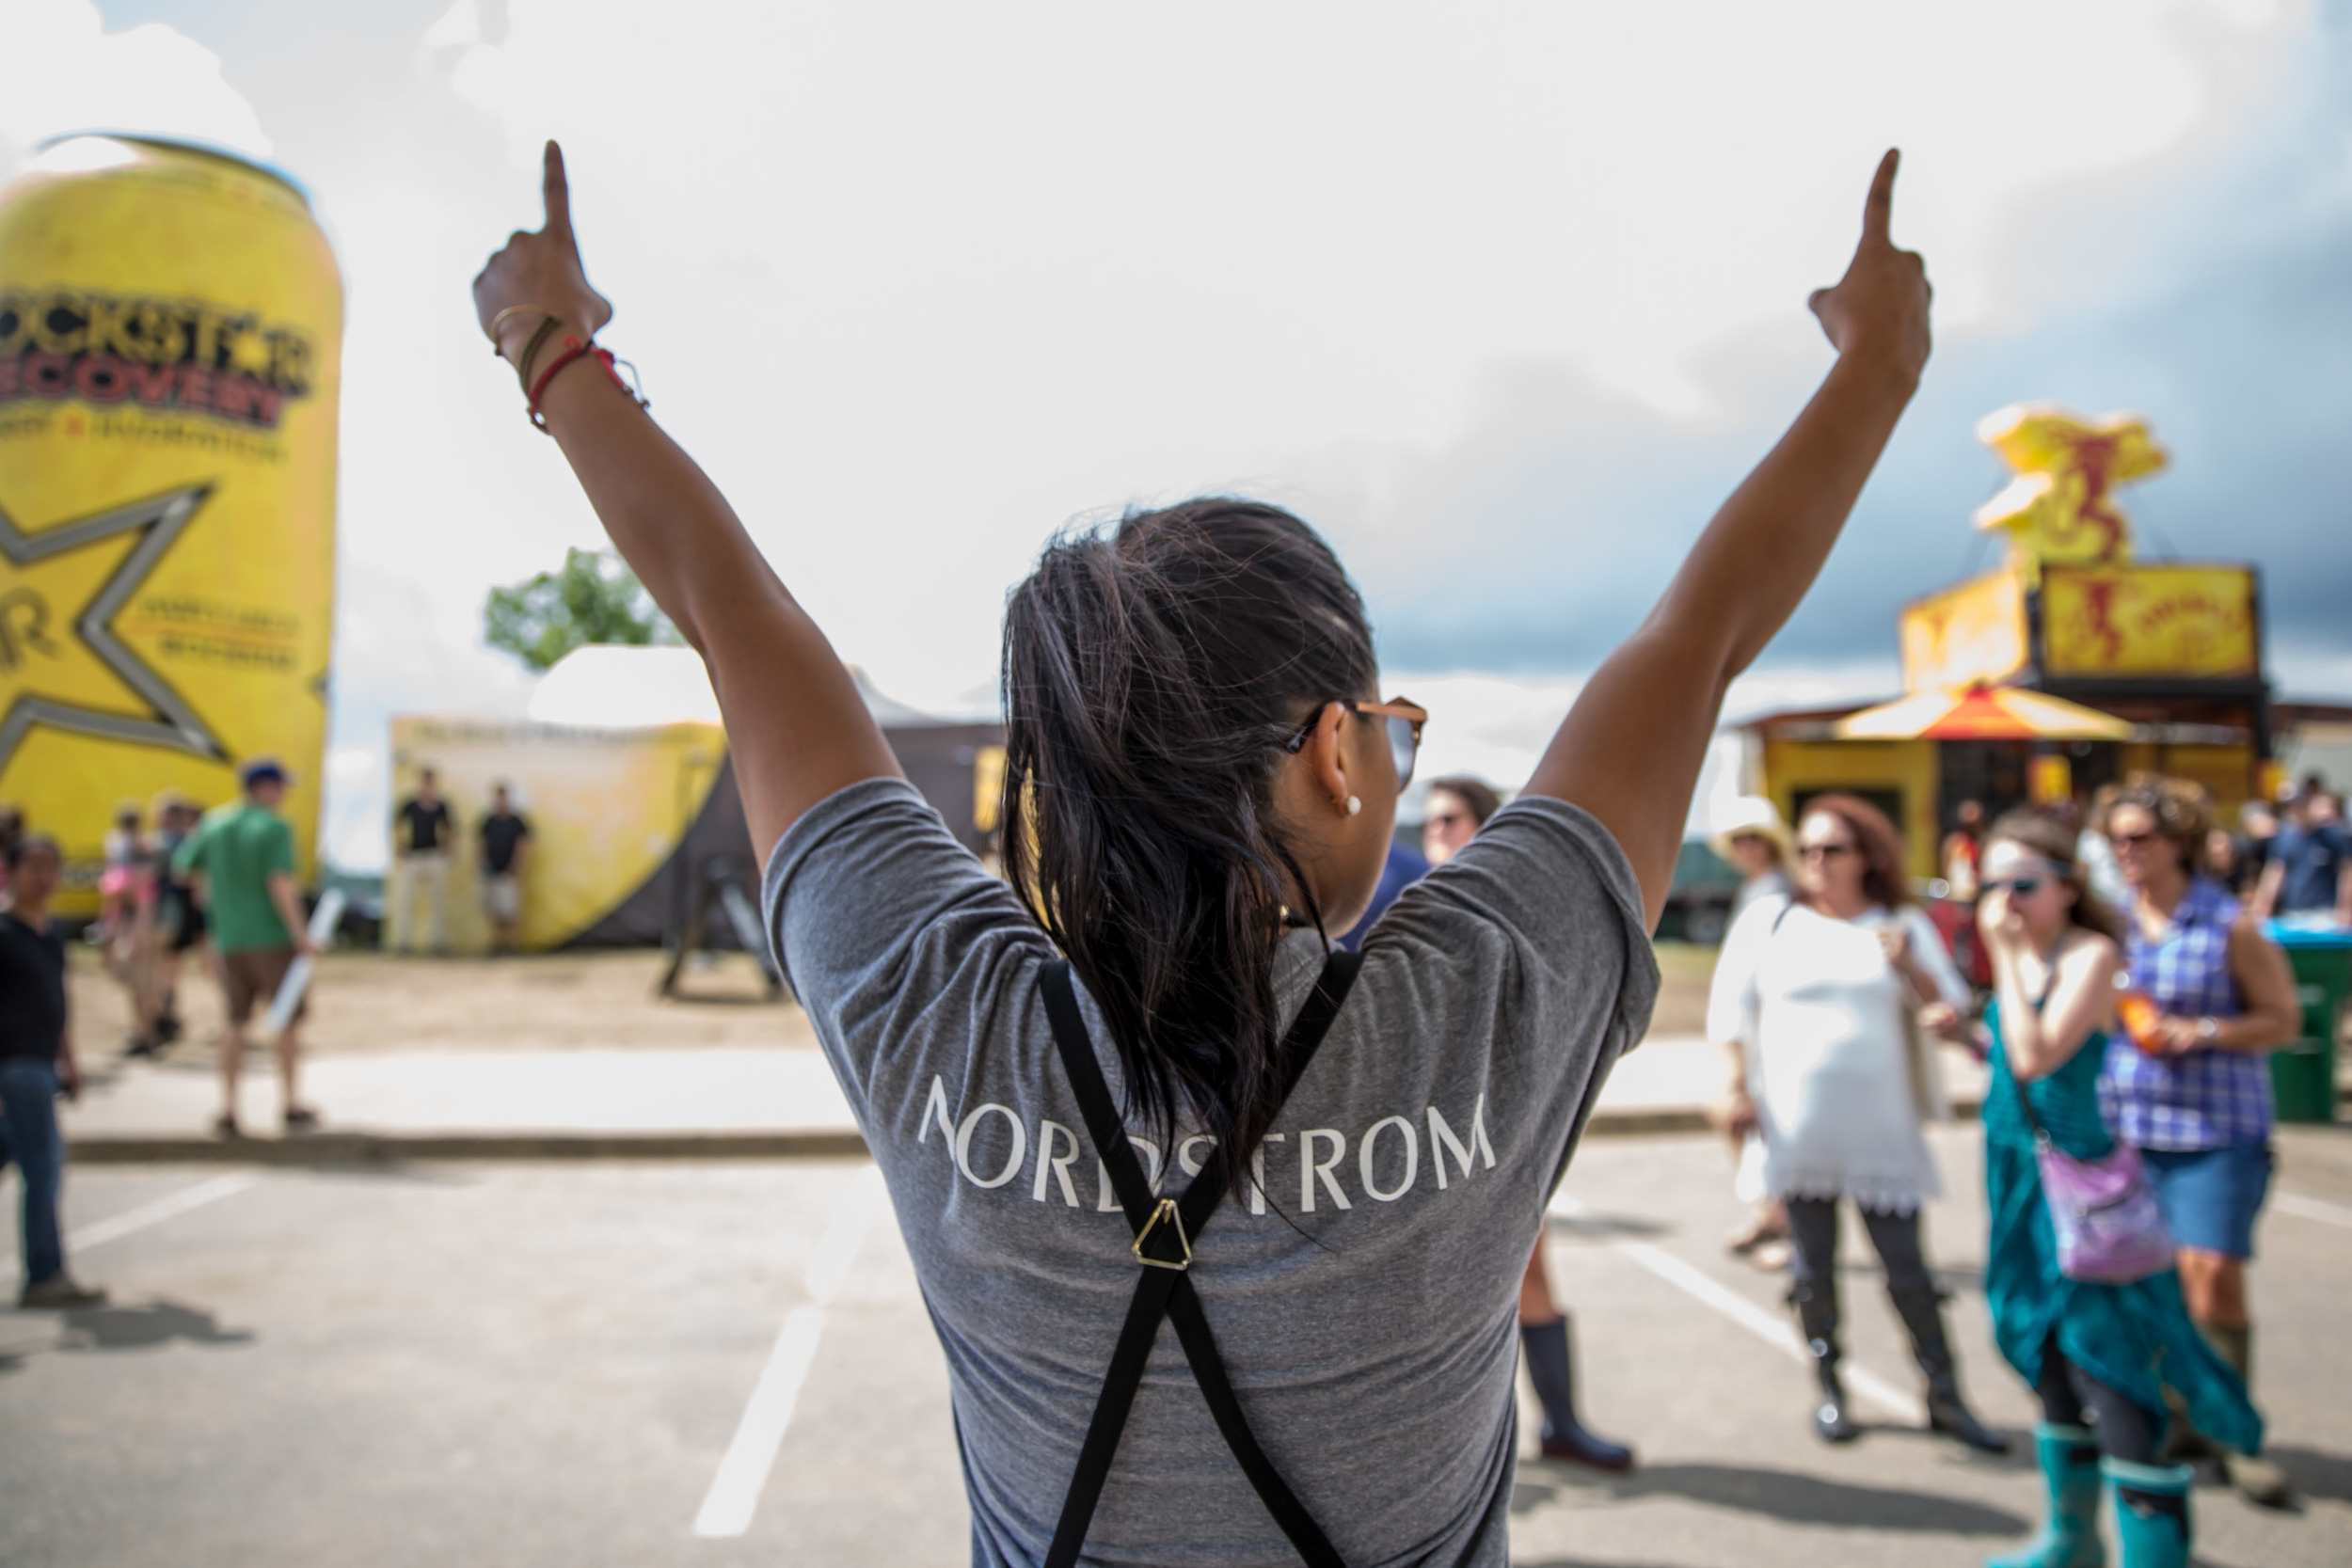 OutCold x Nordstrom Pod Tour 2016 2